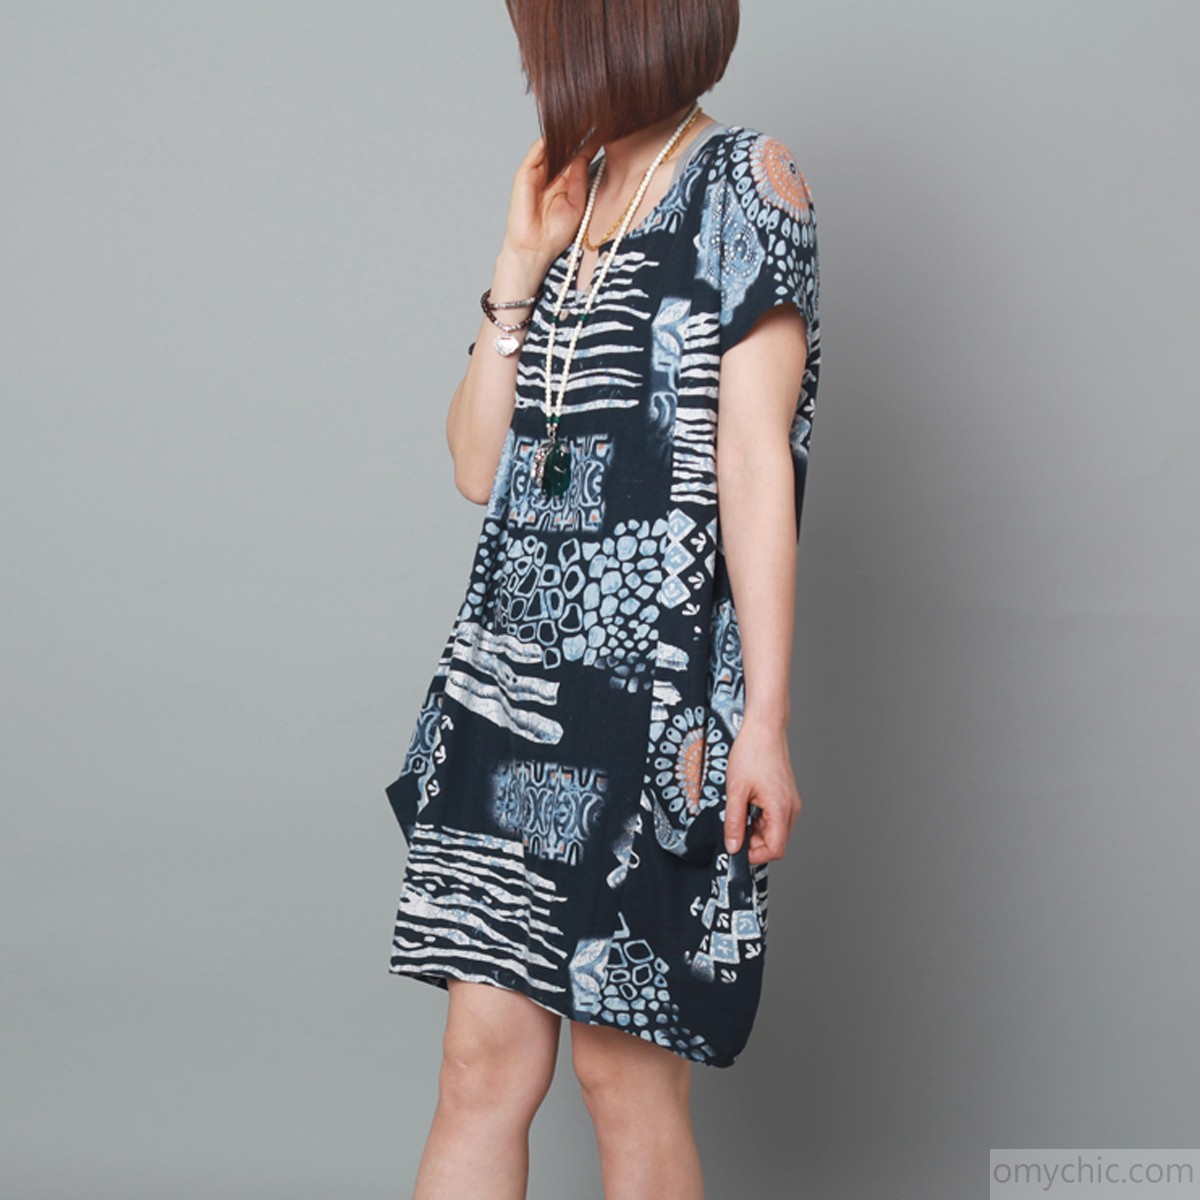 Bloomingdales Maternity   Designer Maternity Clothes   Maternity Sundress